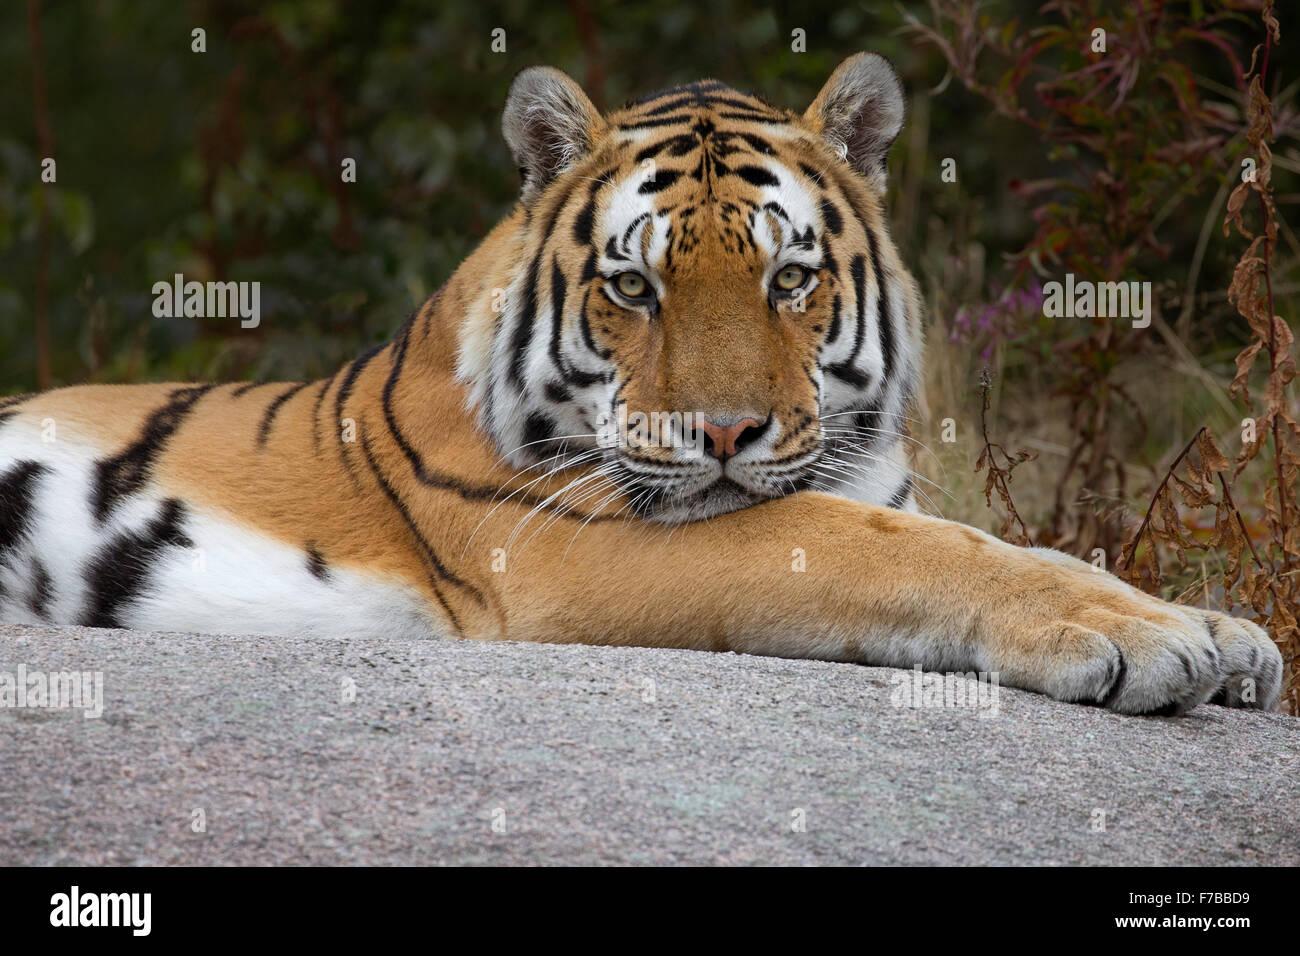 Amur tiger - Stock Image